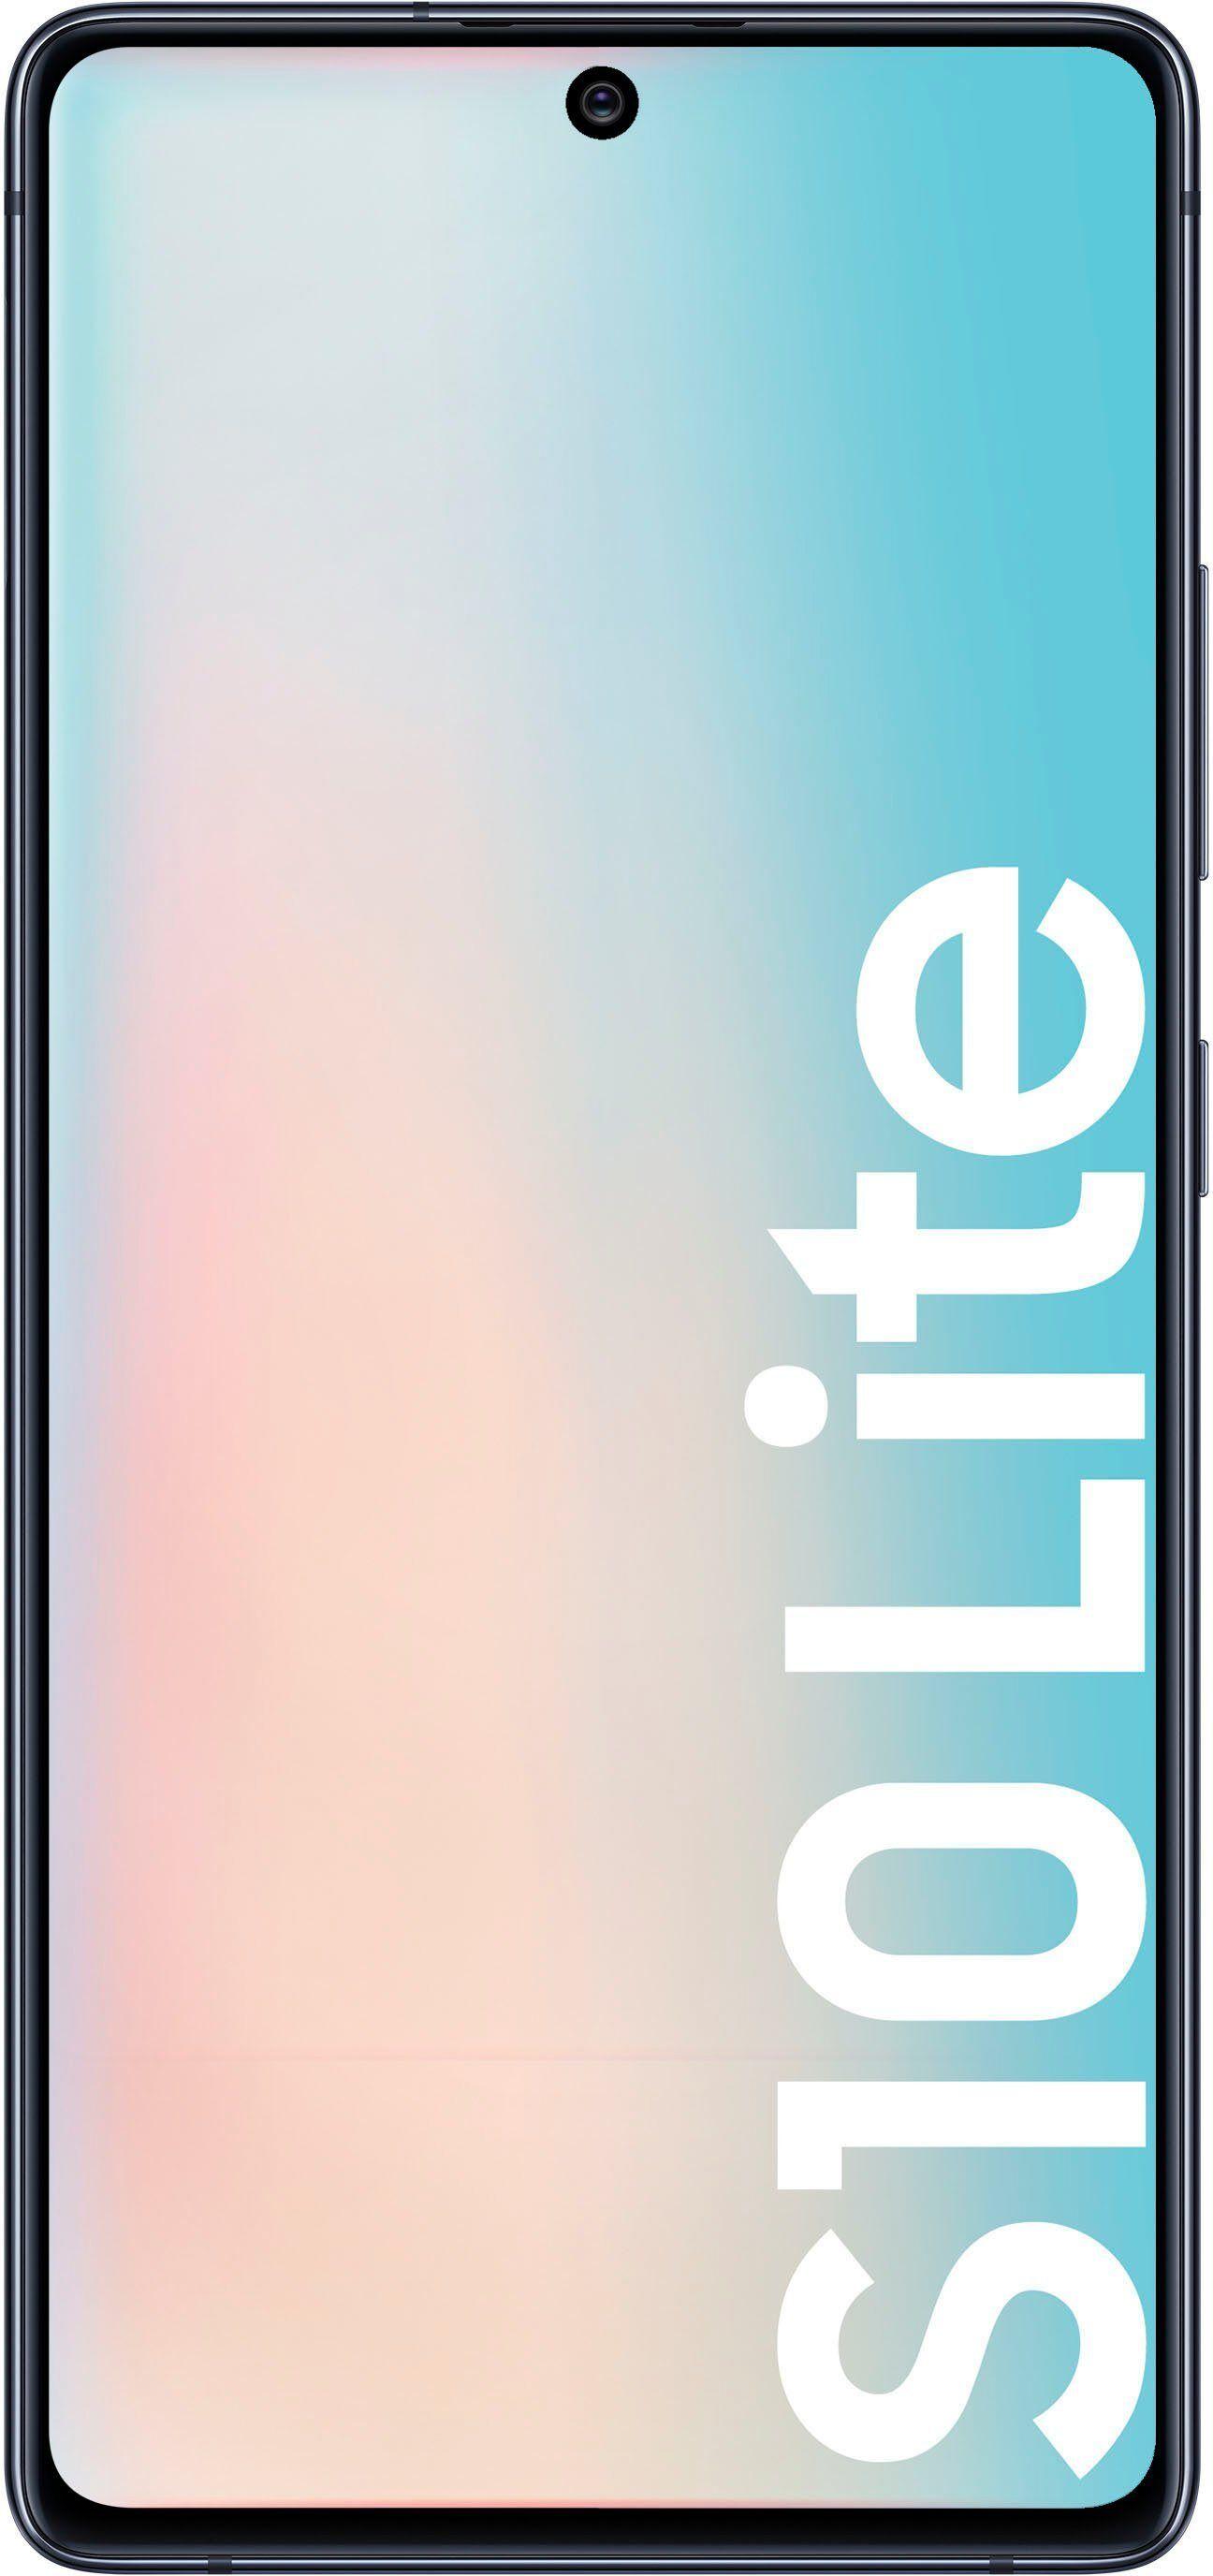 Samsung Galaxy S10 Lite Smartphone (16,95 cm/6,7 Zoll, 128 GB Speicherplatz, 48 MP Kamera), prism black